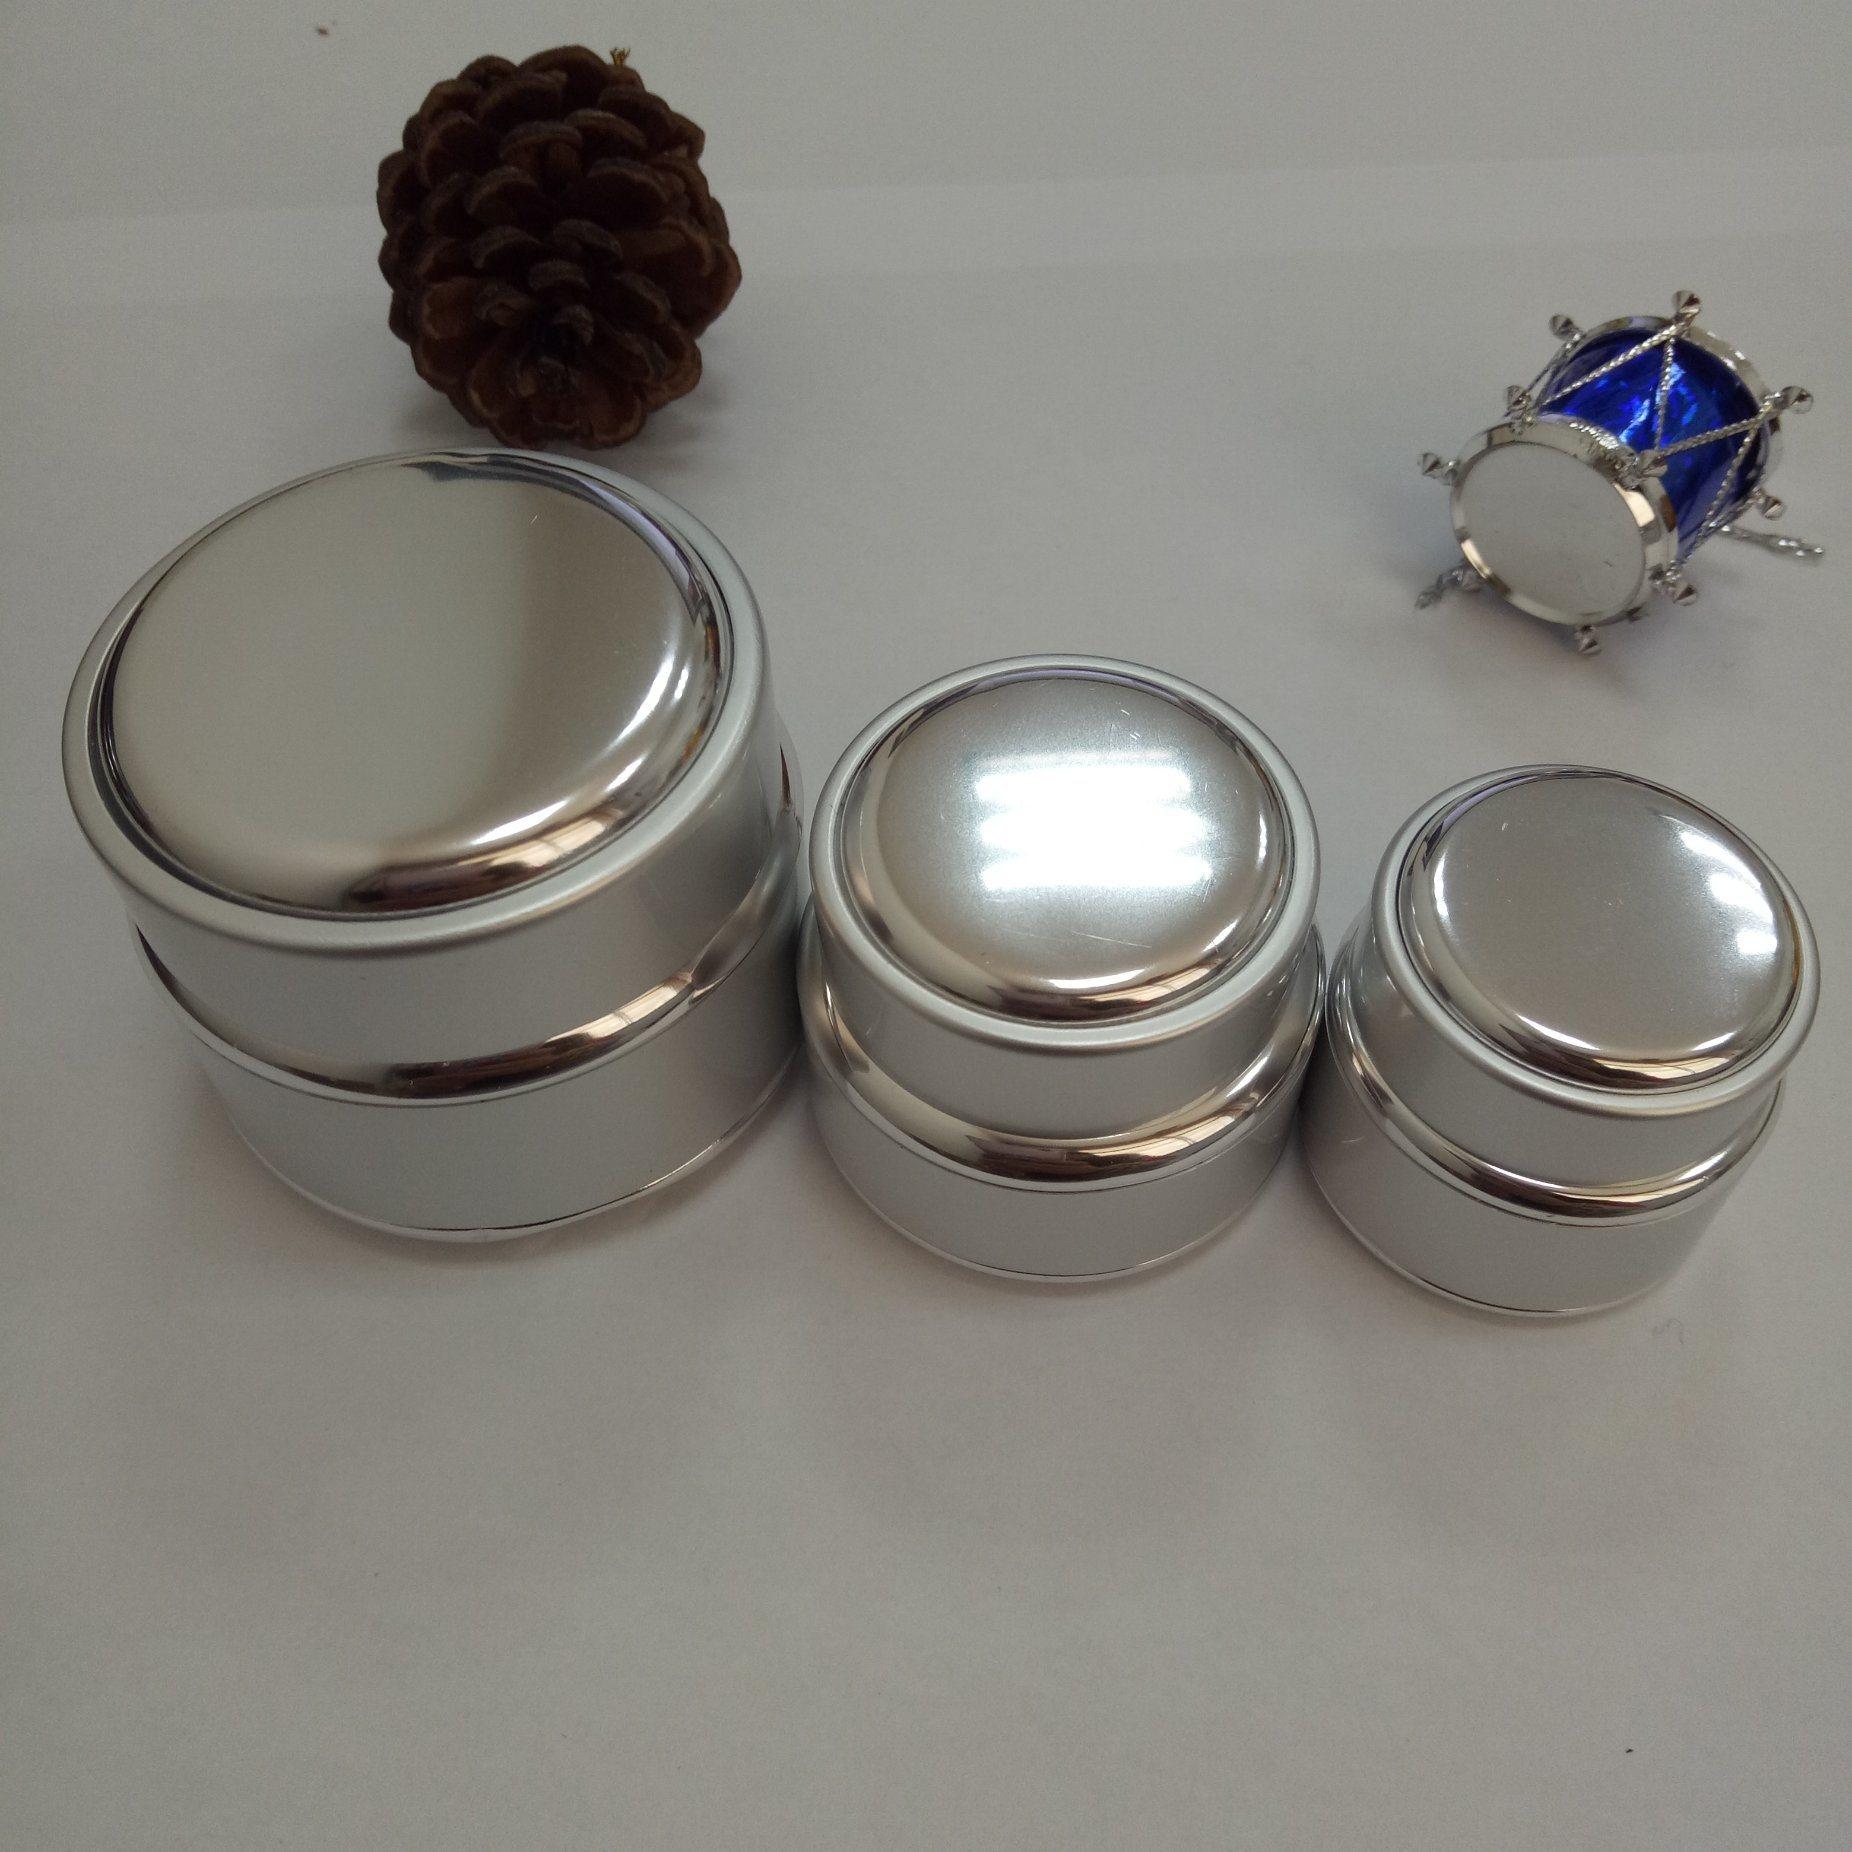 Gel Cream Packing Aluminum Sheathed Glass Jars